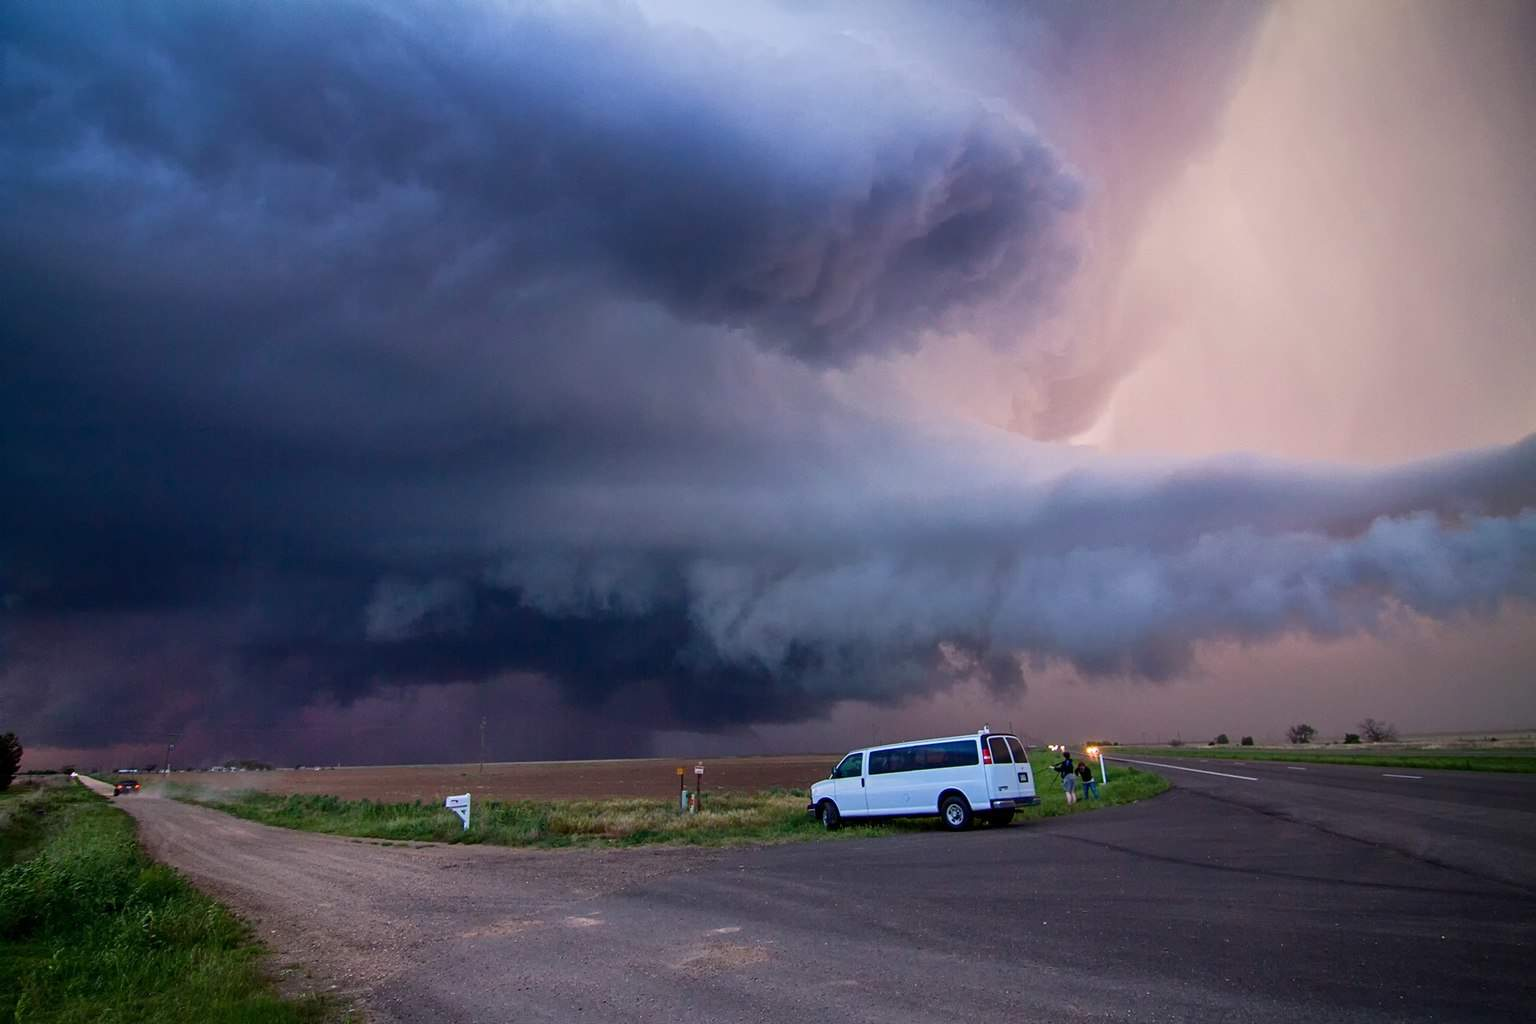 Looking into the beast near Floydada, TX on April 22nd 2015